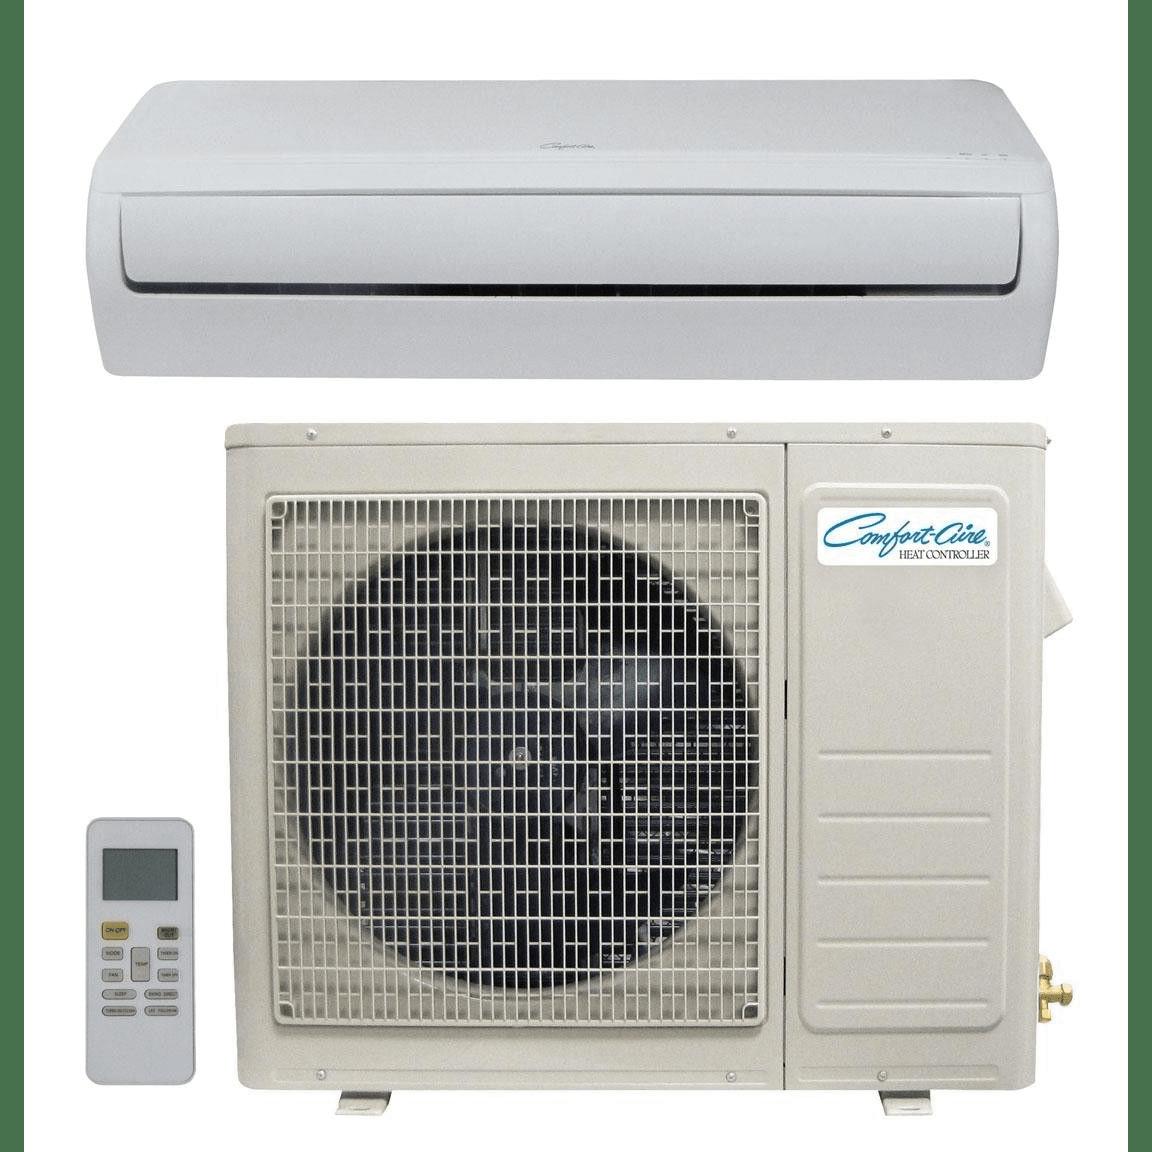 Comfort-Aire DV Series 9,000 BTU Mini Split System co3774k